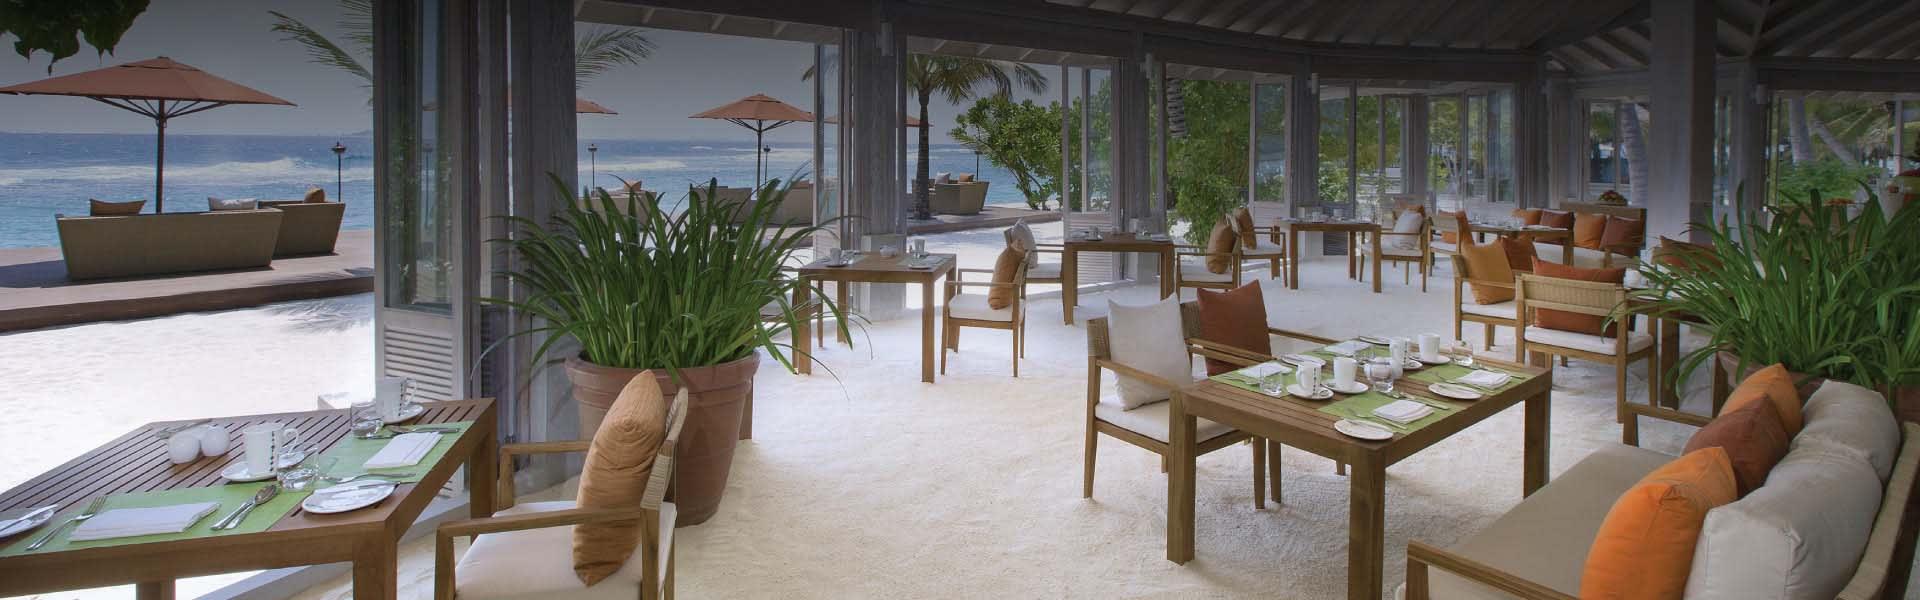 73 Degree Restaurant at Anantara Dhigu Family Resort